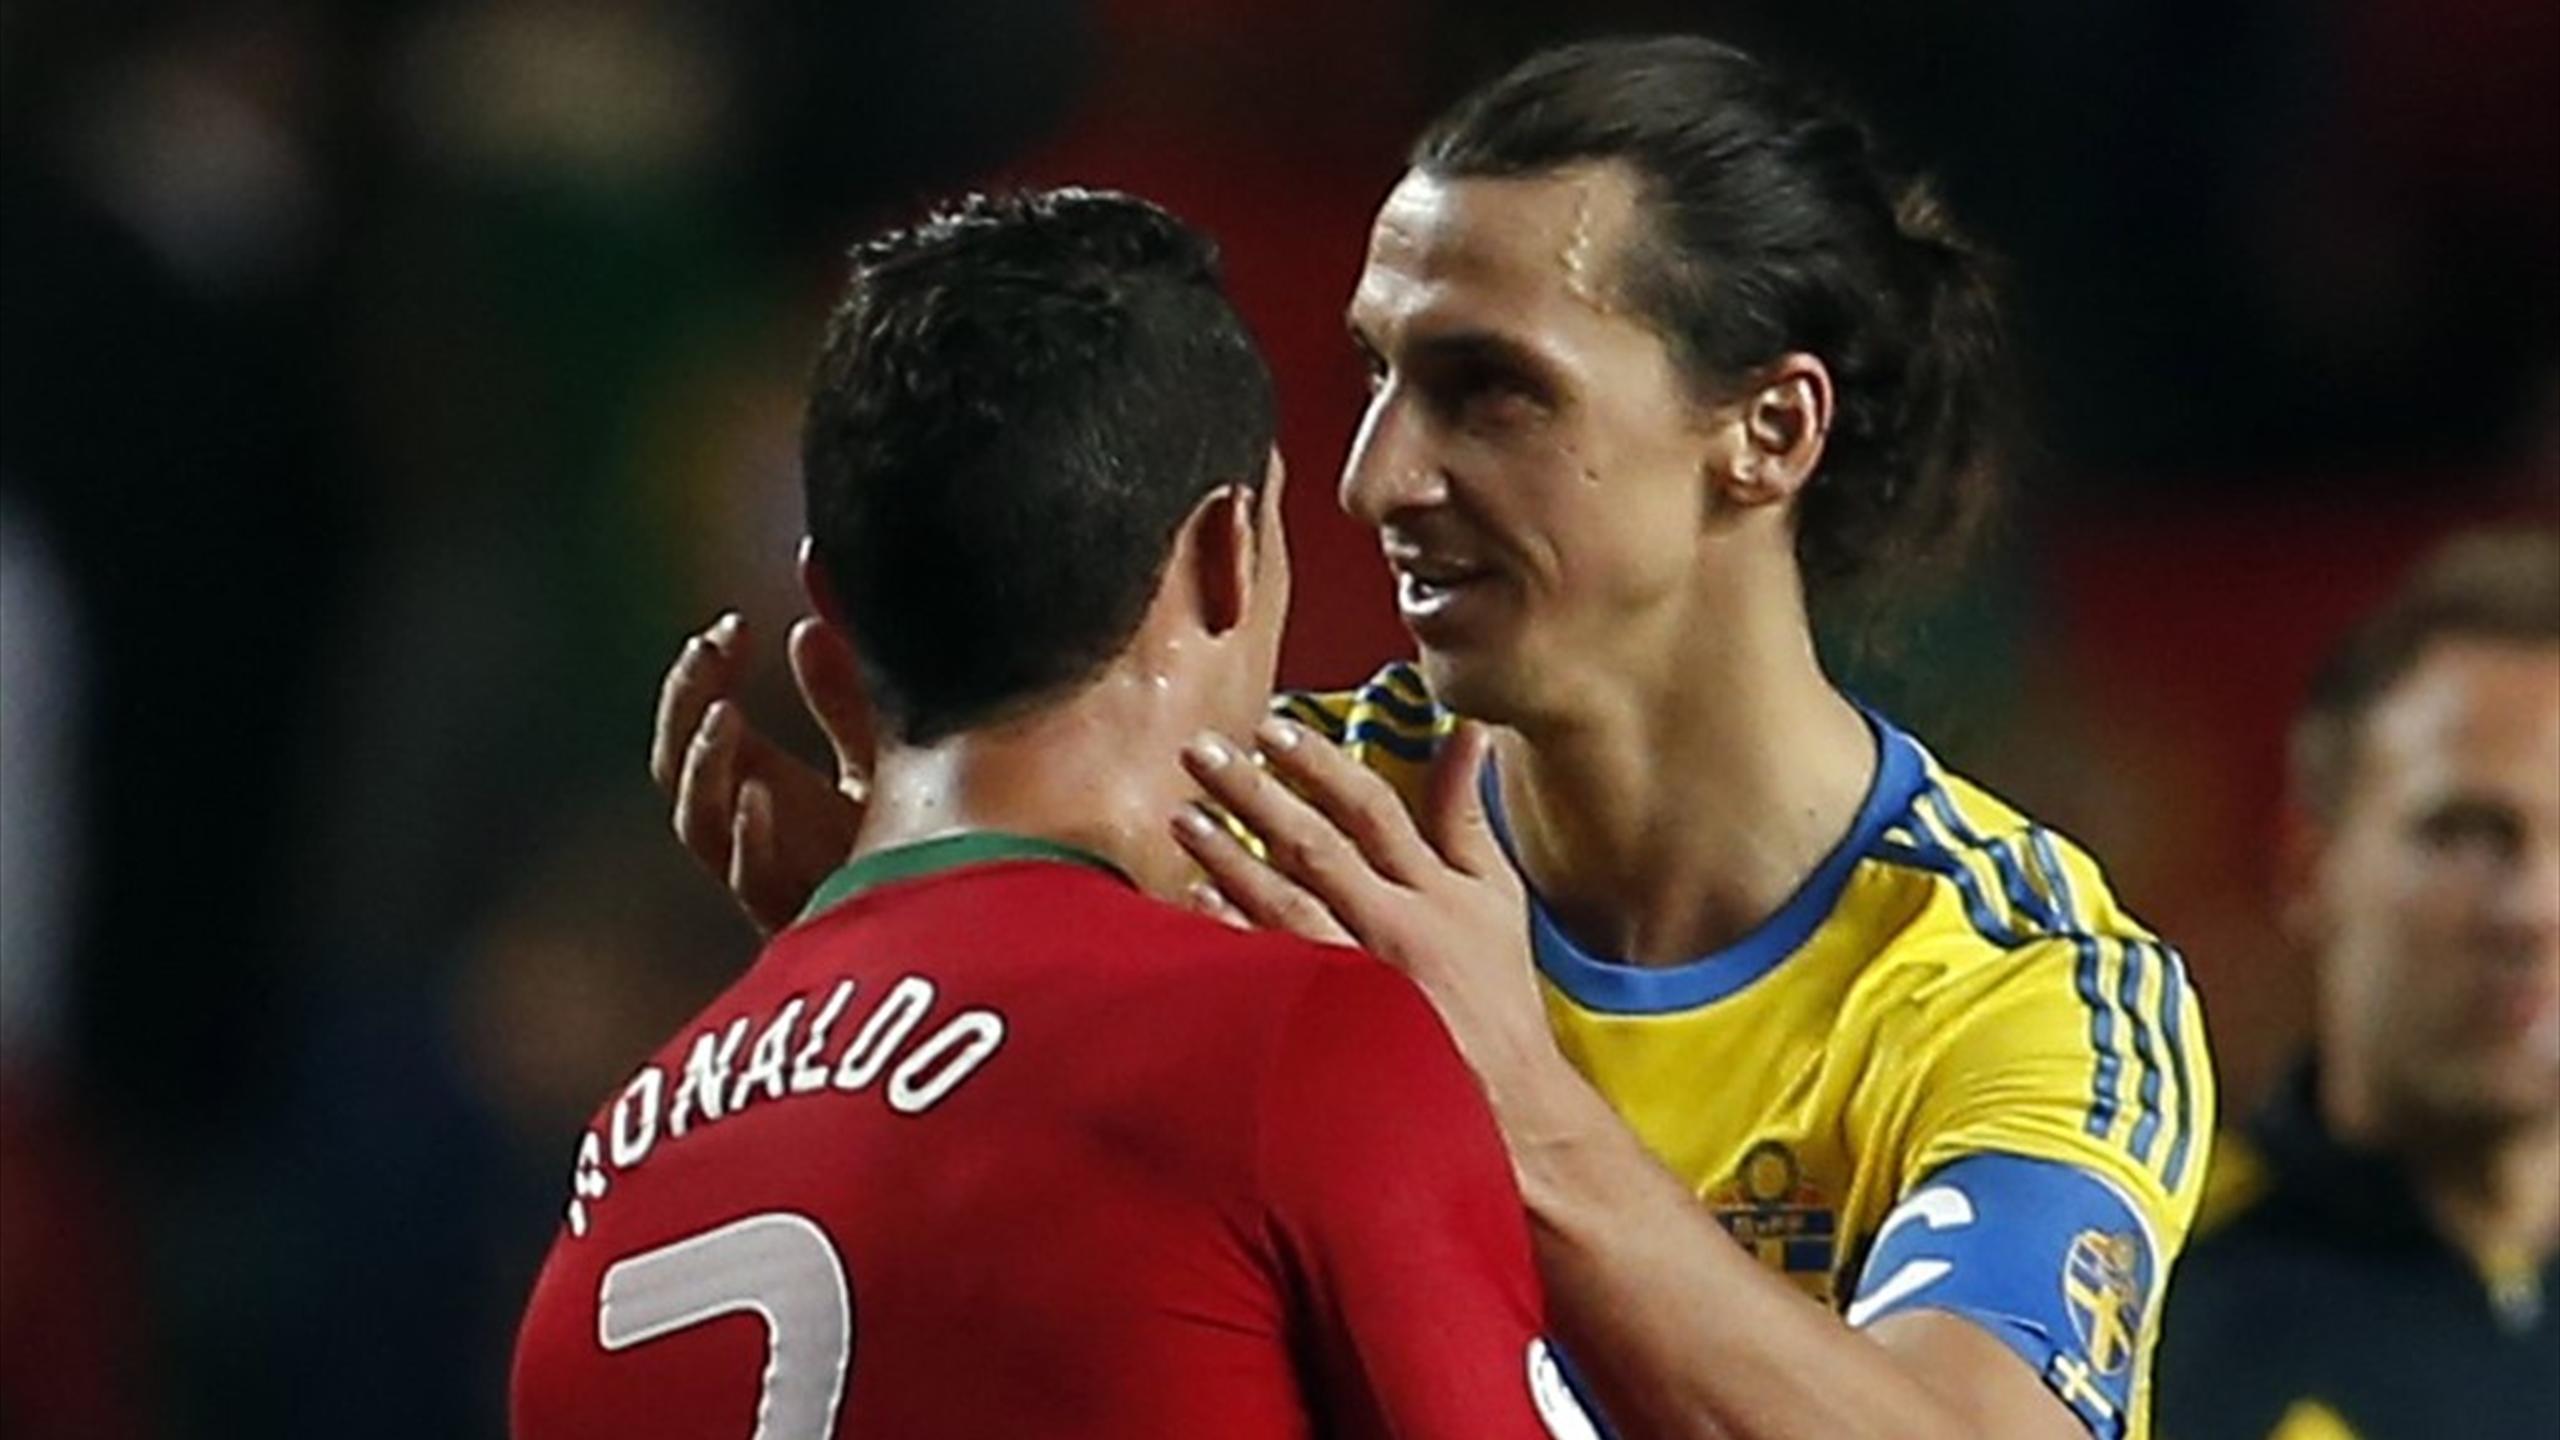 Zlatan Ibrahimovic greets Cristiano Ronaldo